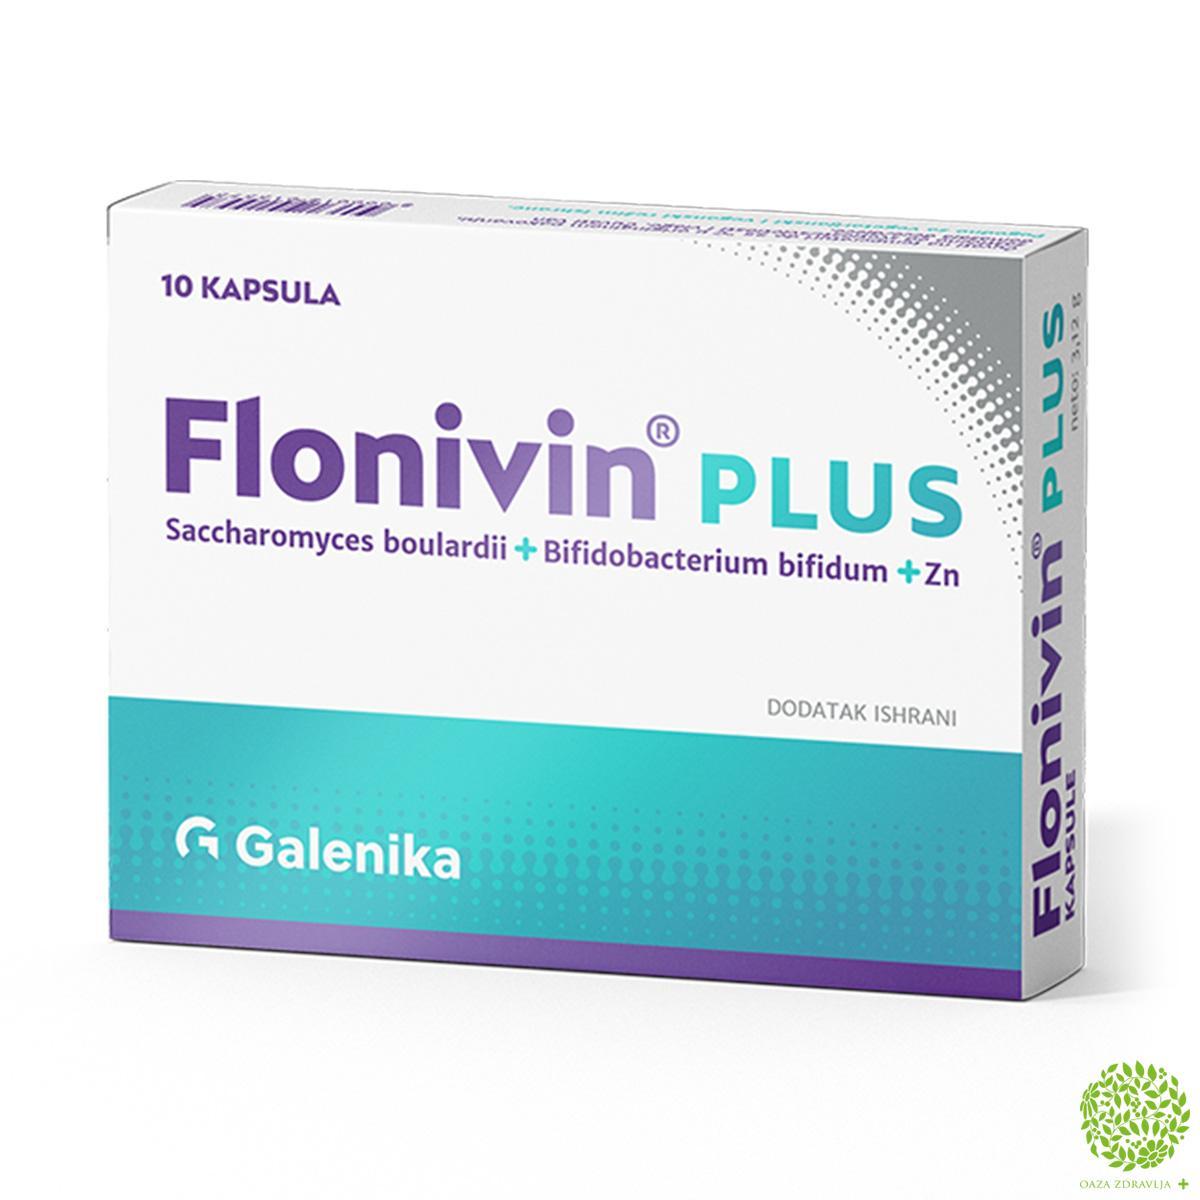 FLONIVIN PLUS 10 kapsula